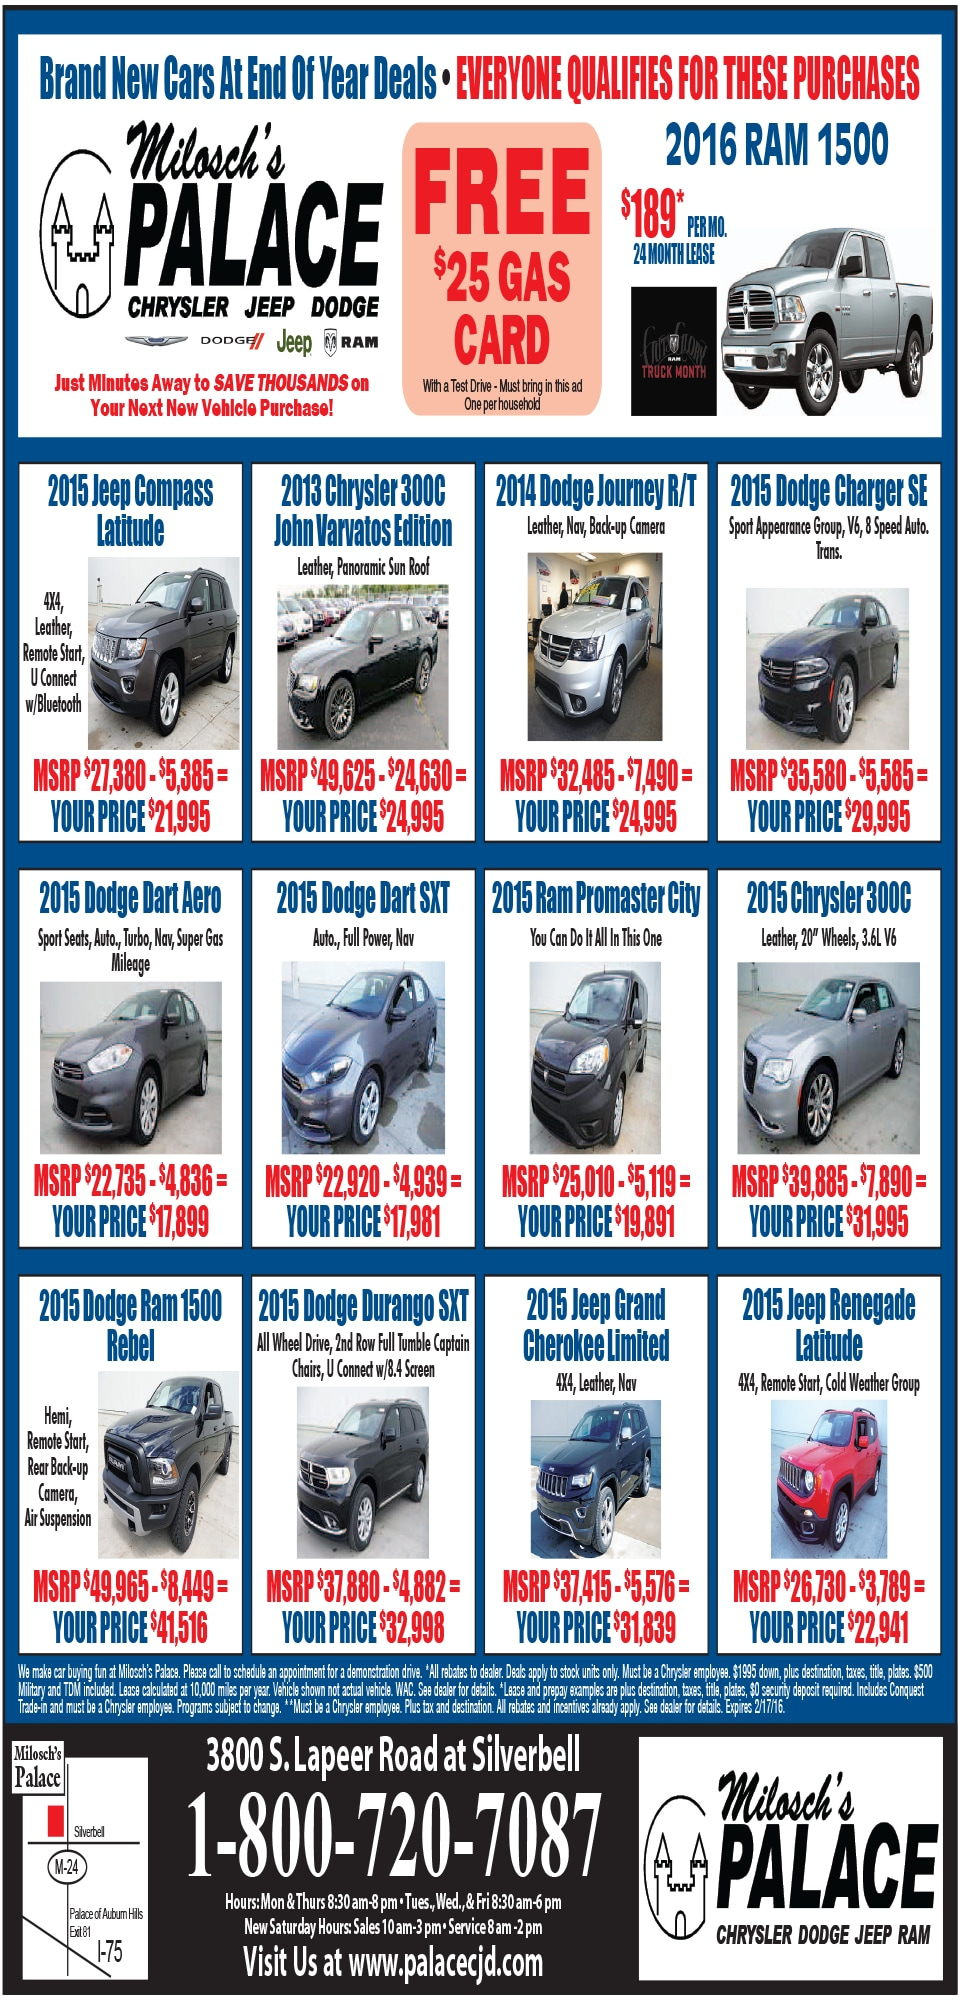 award smith jeep part ram world dealership chrysler motors s parts dealer dave dodge largest watch